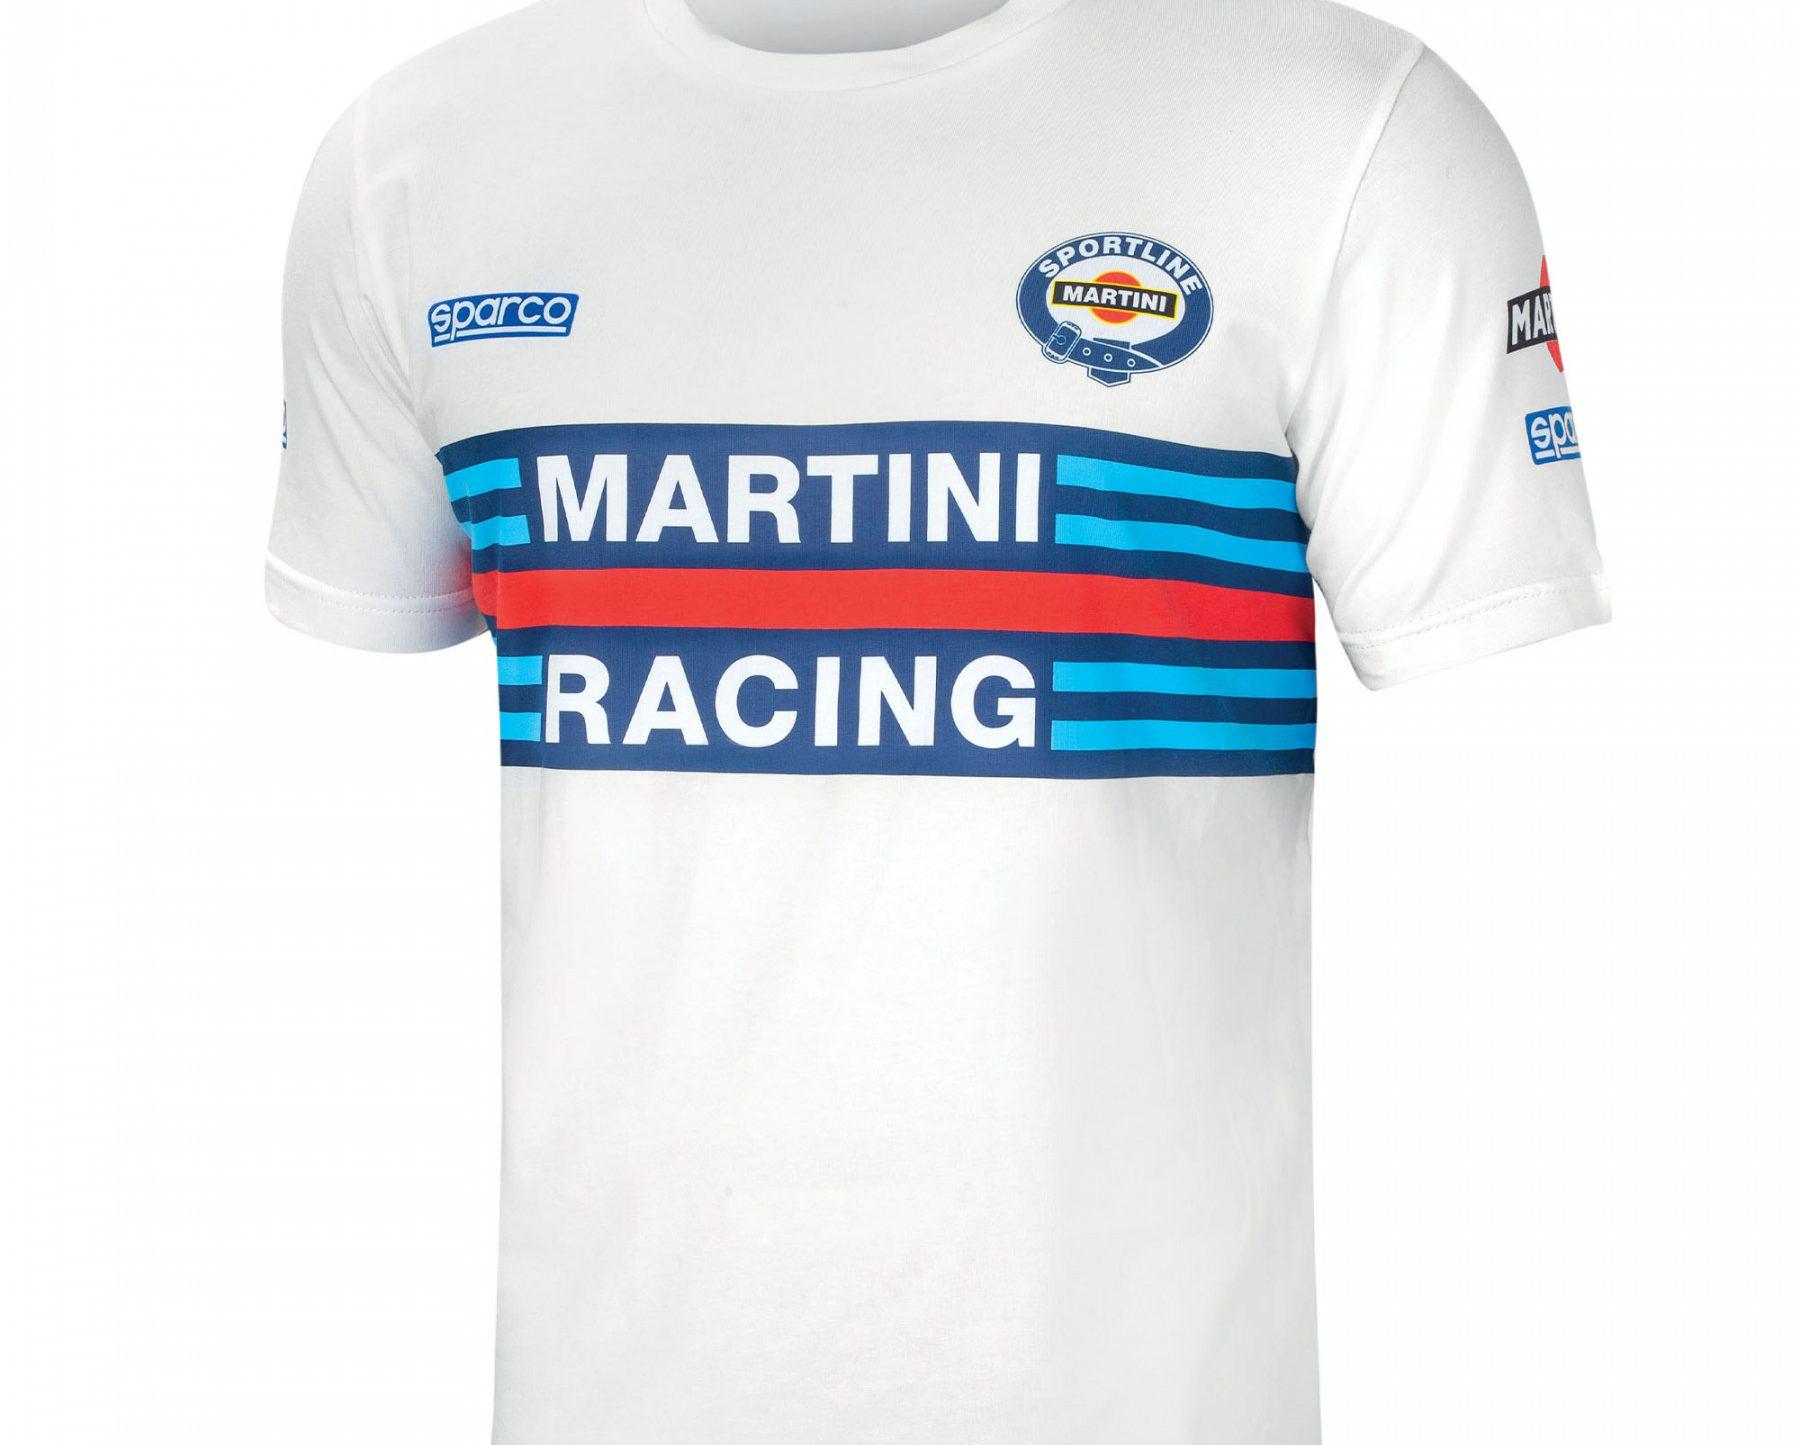 Нов продукт: Sparco Martini Racing, T-shirt